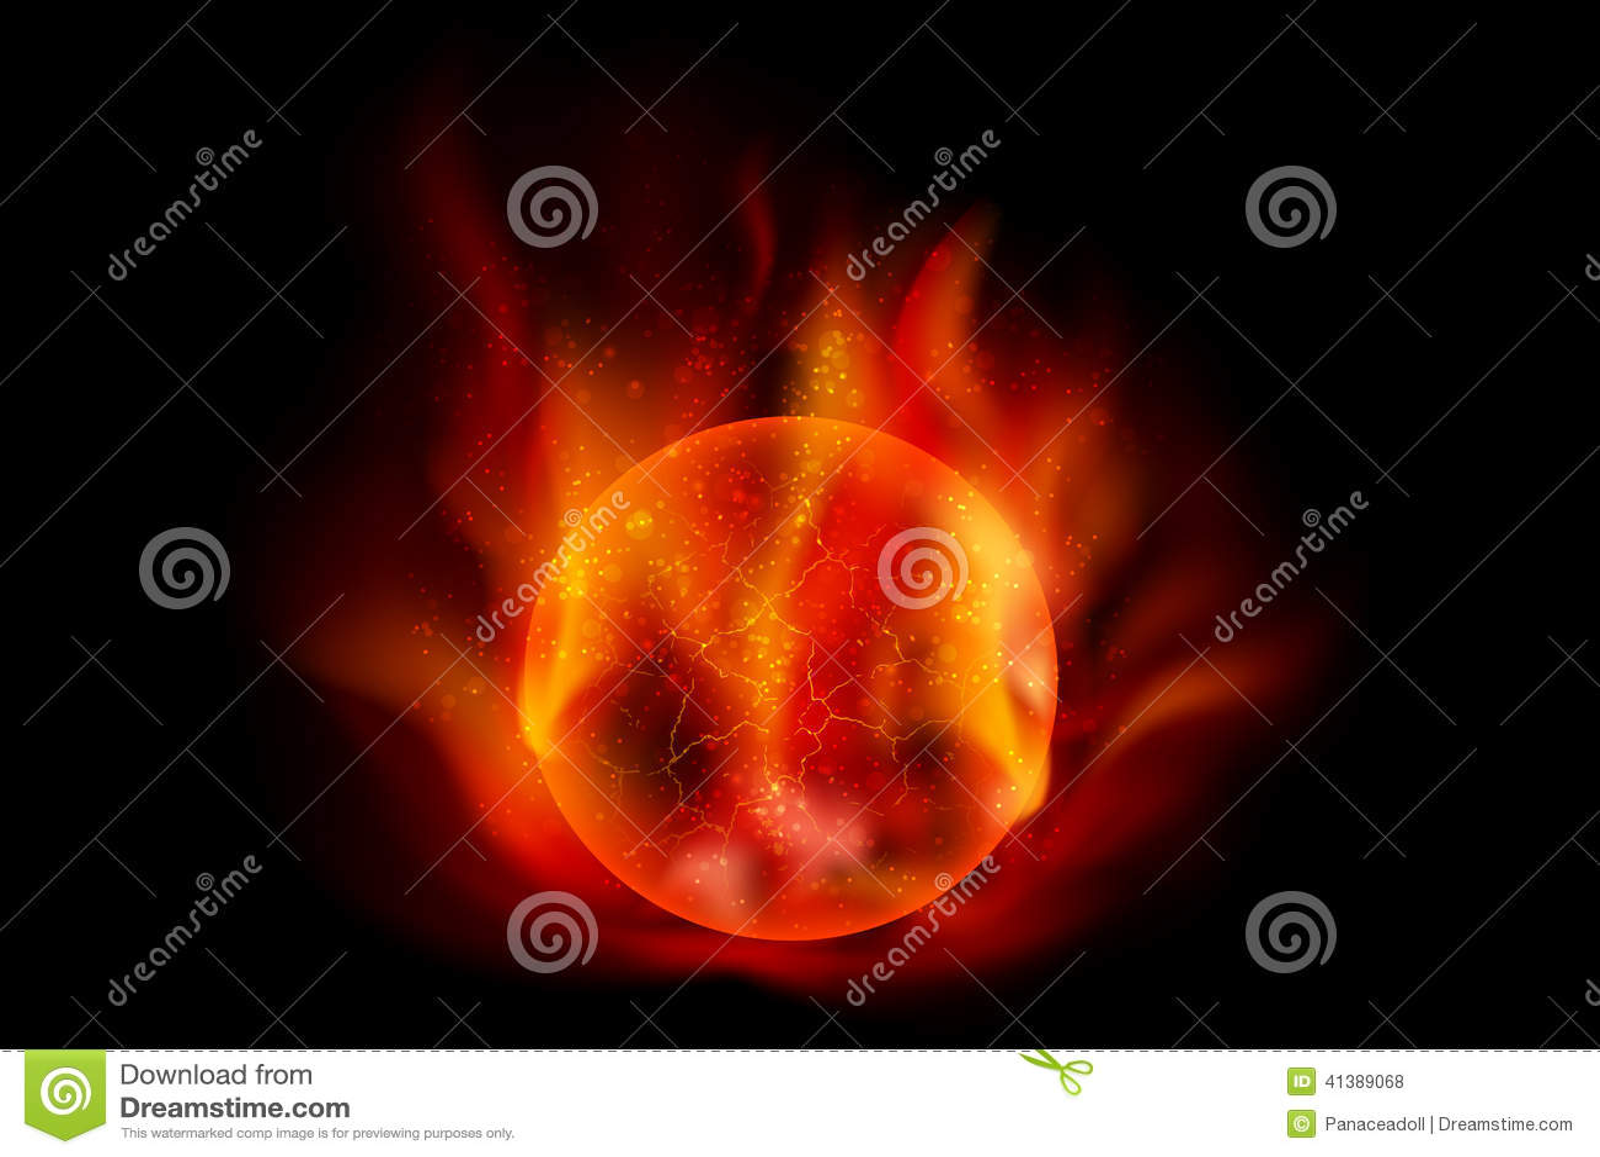 Fireball Stock Vector - Image: 41389068